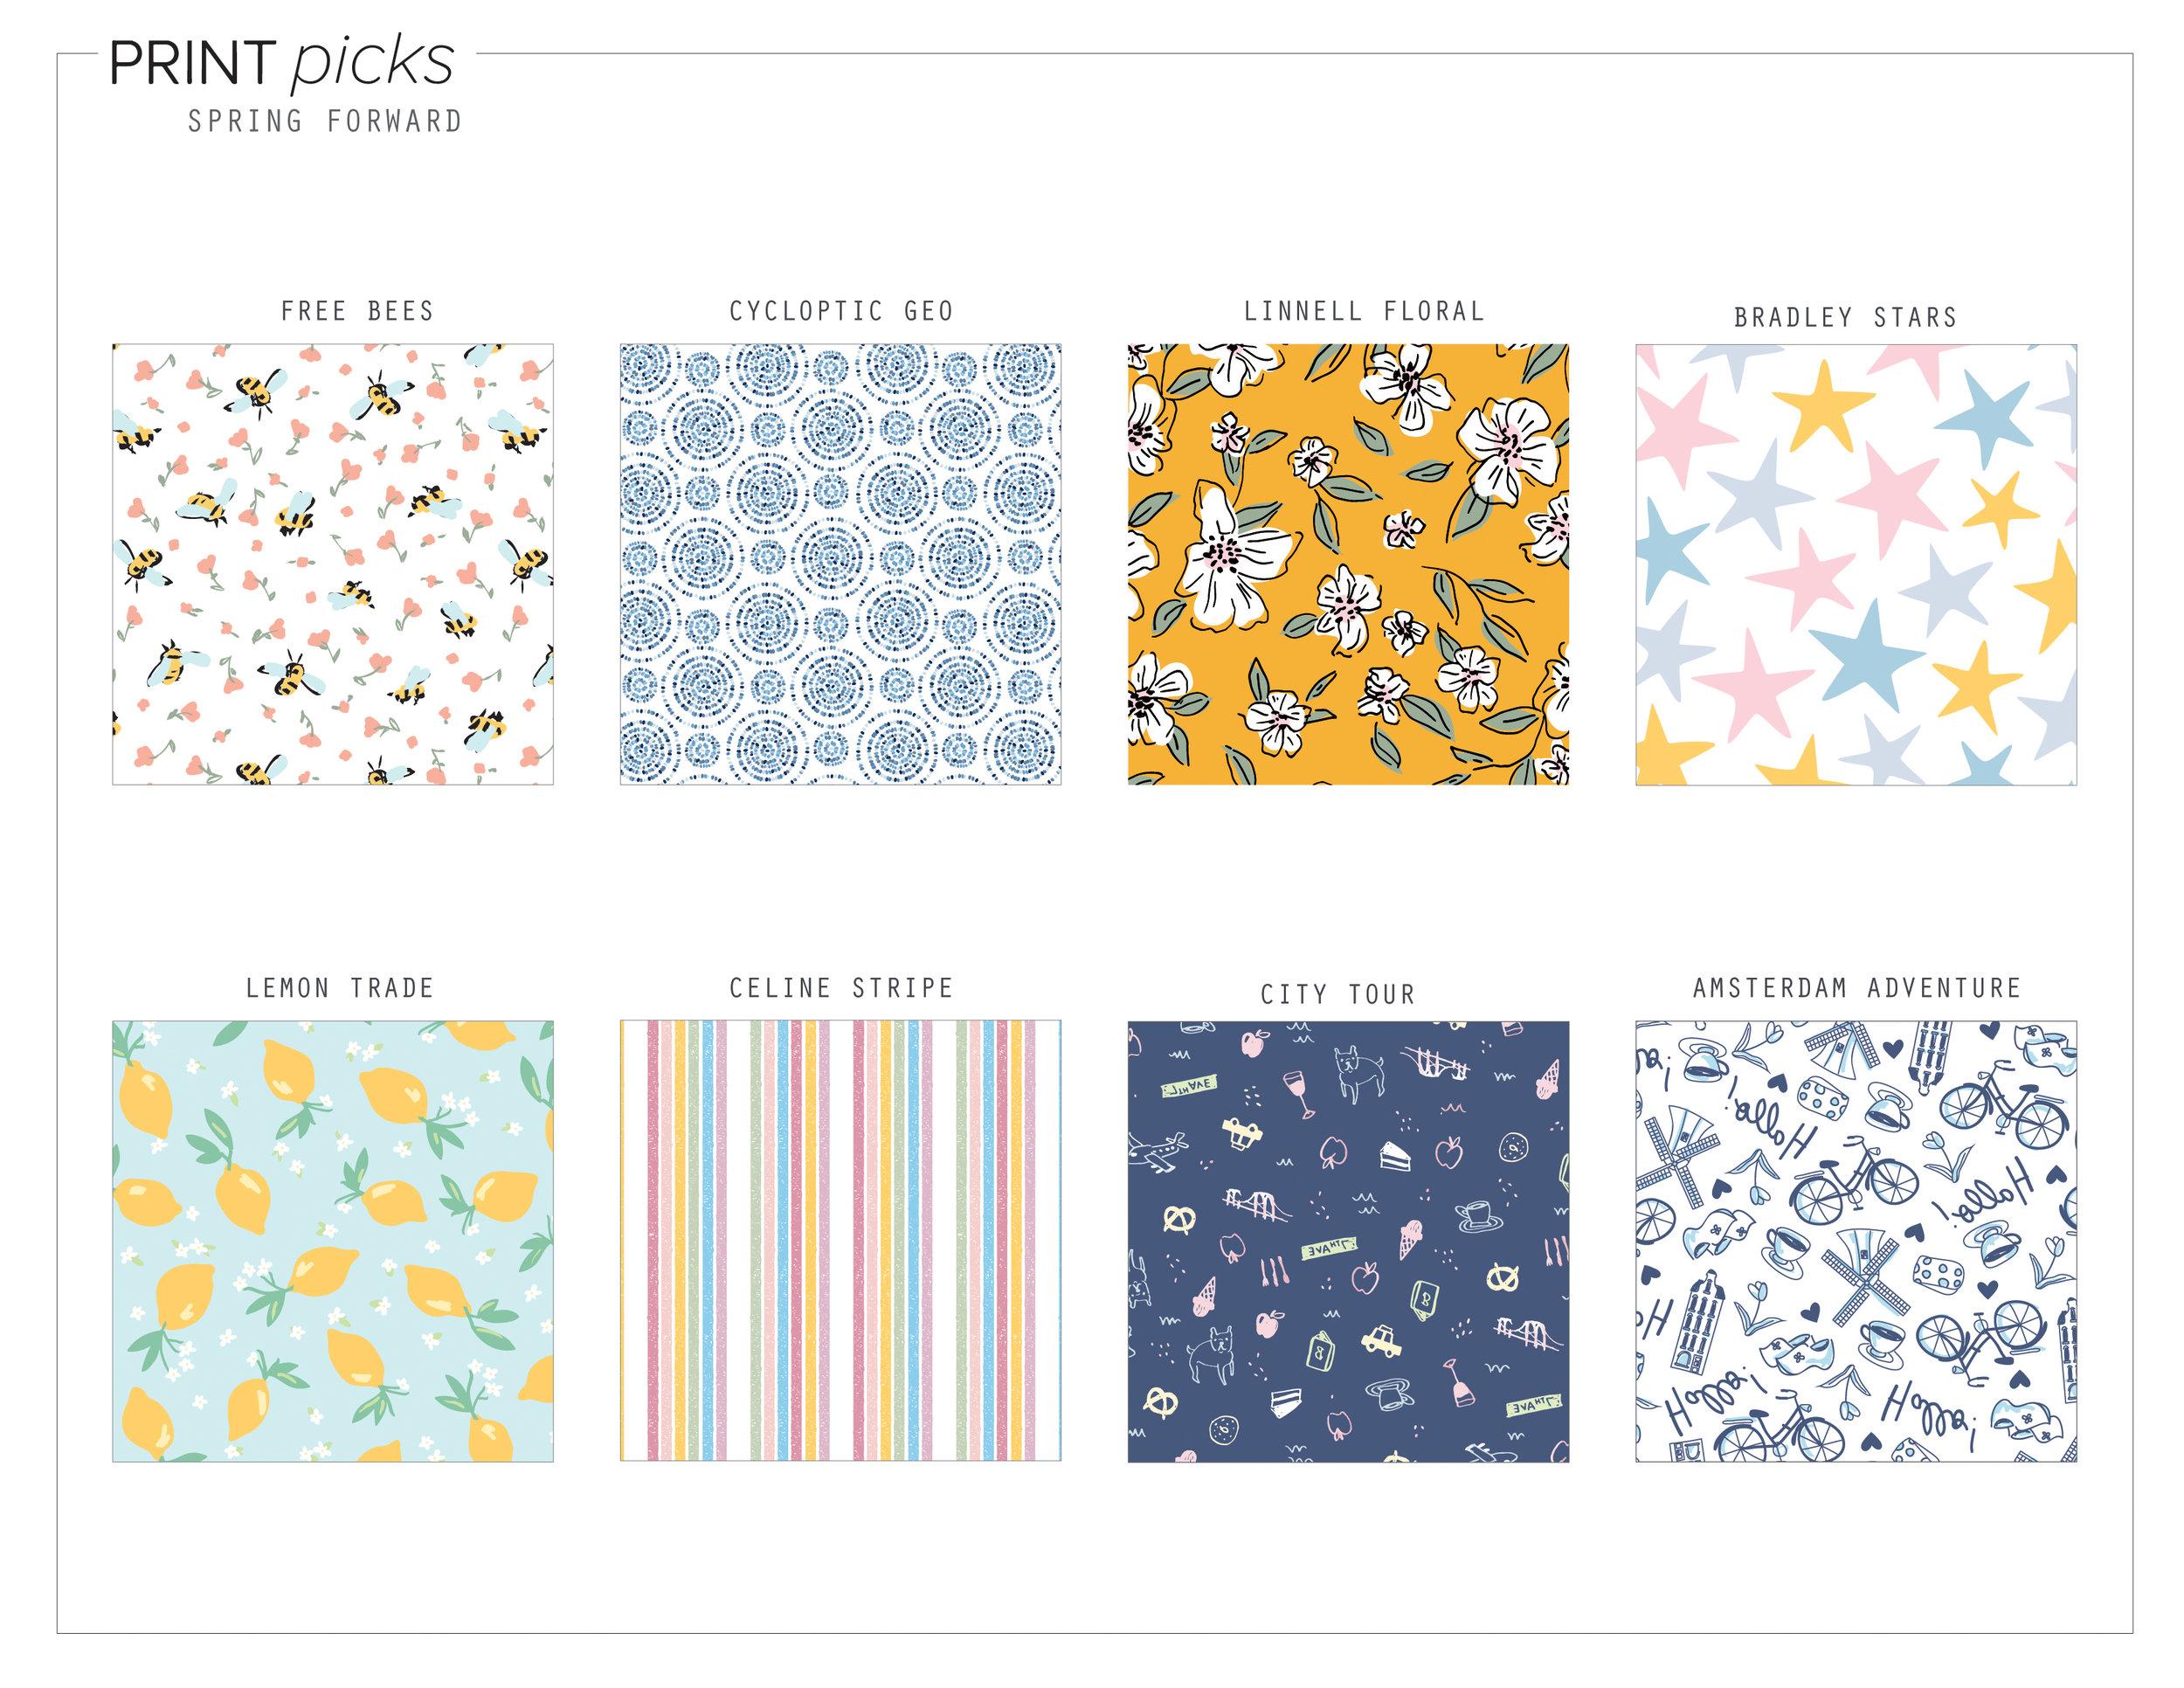 Print Picks-SPRING FORWARD-01.jpg